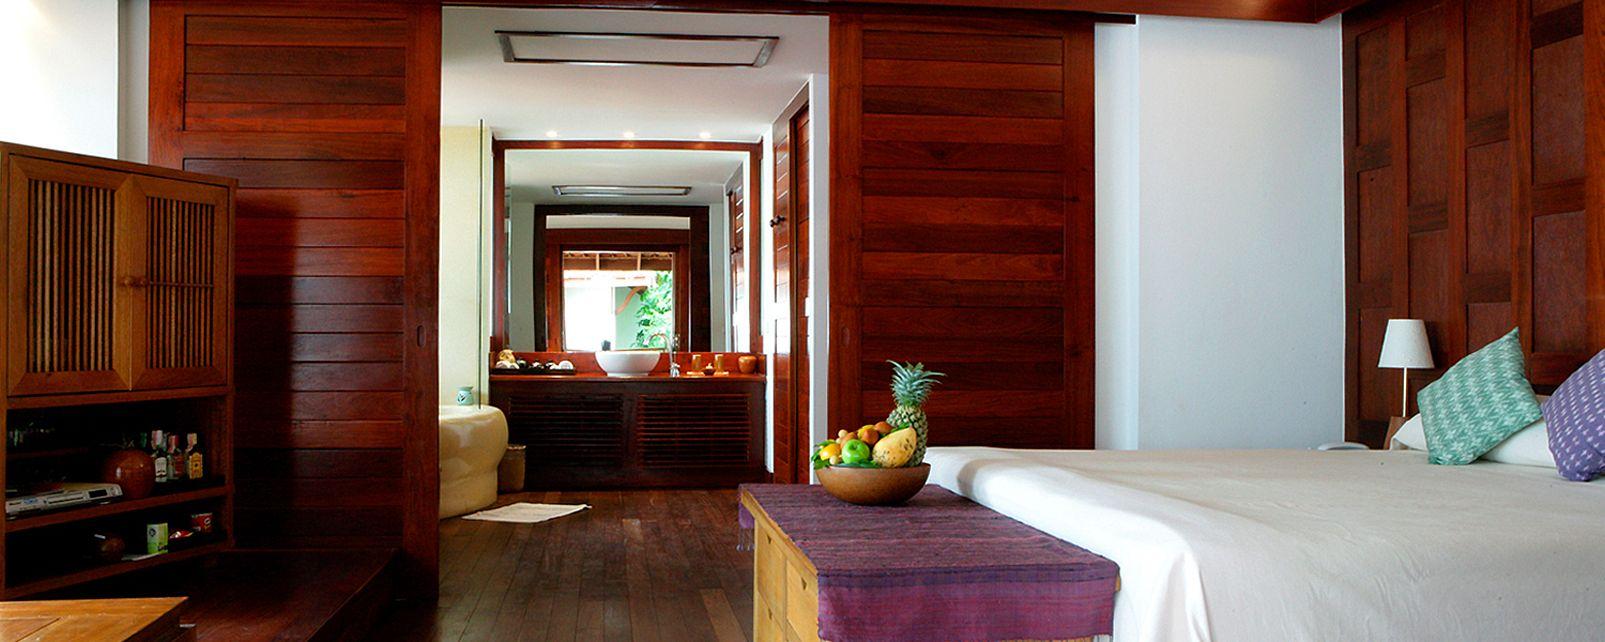 Hotel Napasai Orient-Express